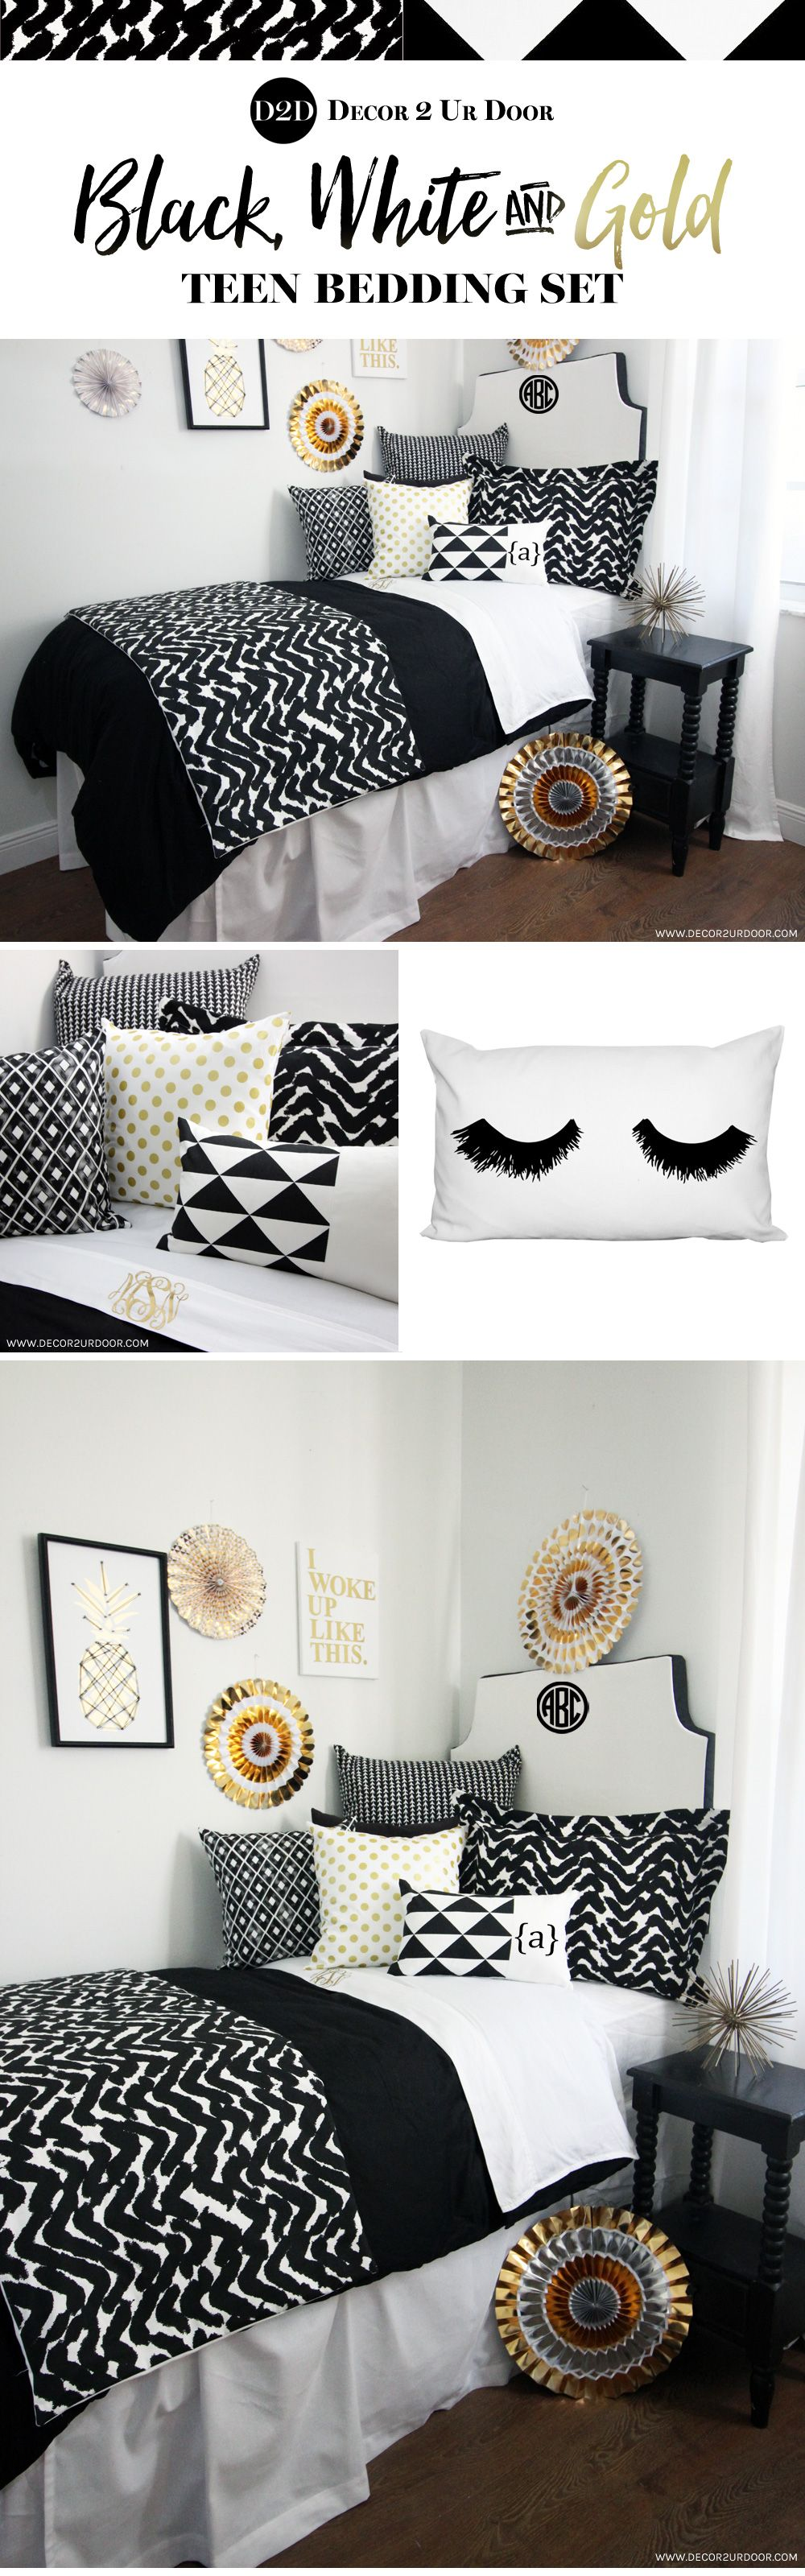 Black white gold marker designer teen girls bedding - White and gold bedroom furniture set ...